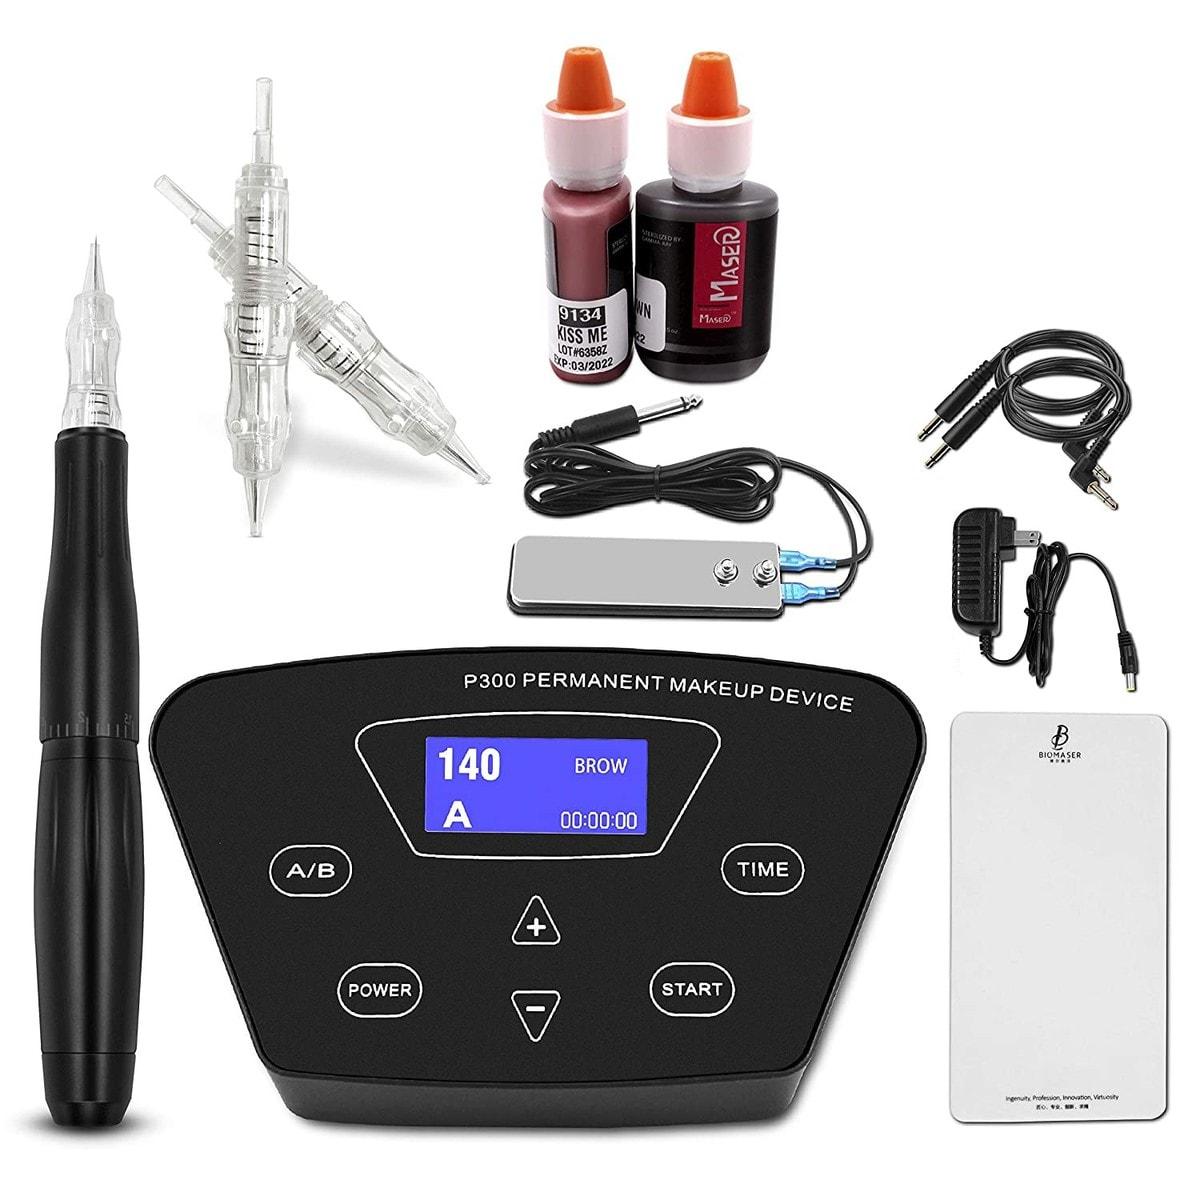 BIOAMSER P300 Permanent Makeup Machine